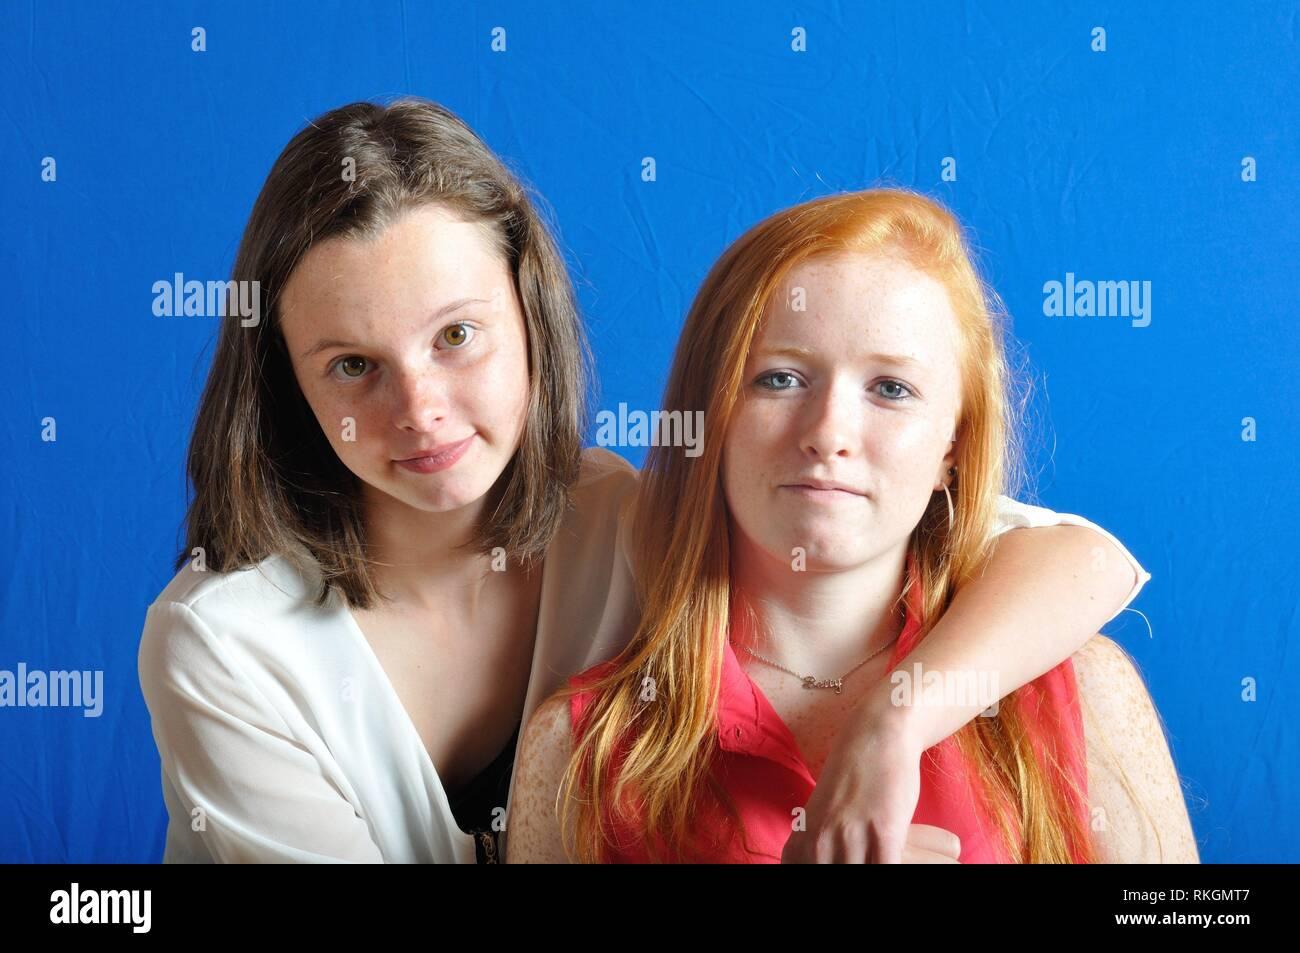 Complicity between two teens. - Stock Image